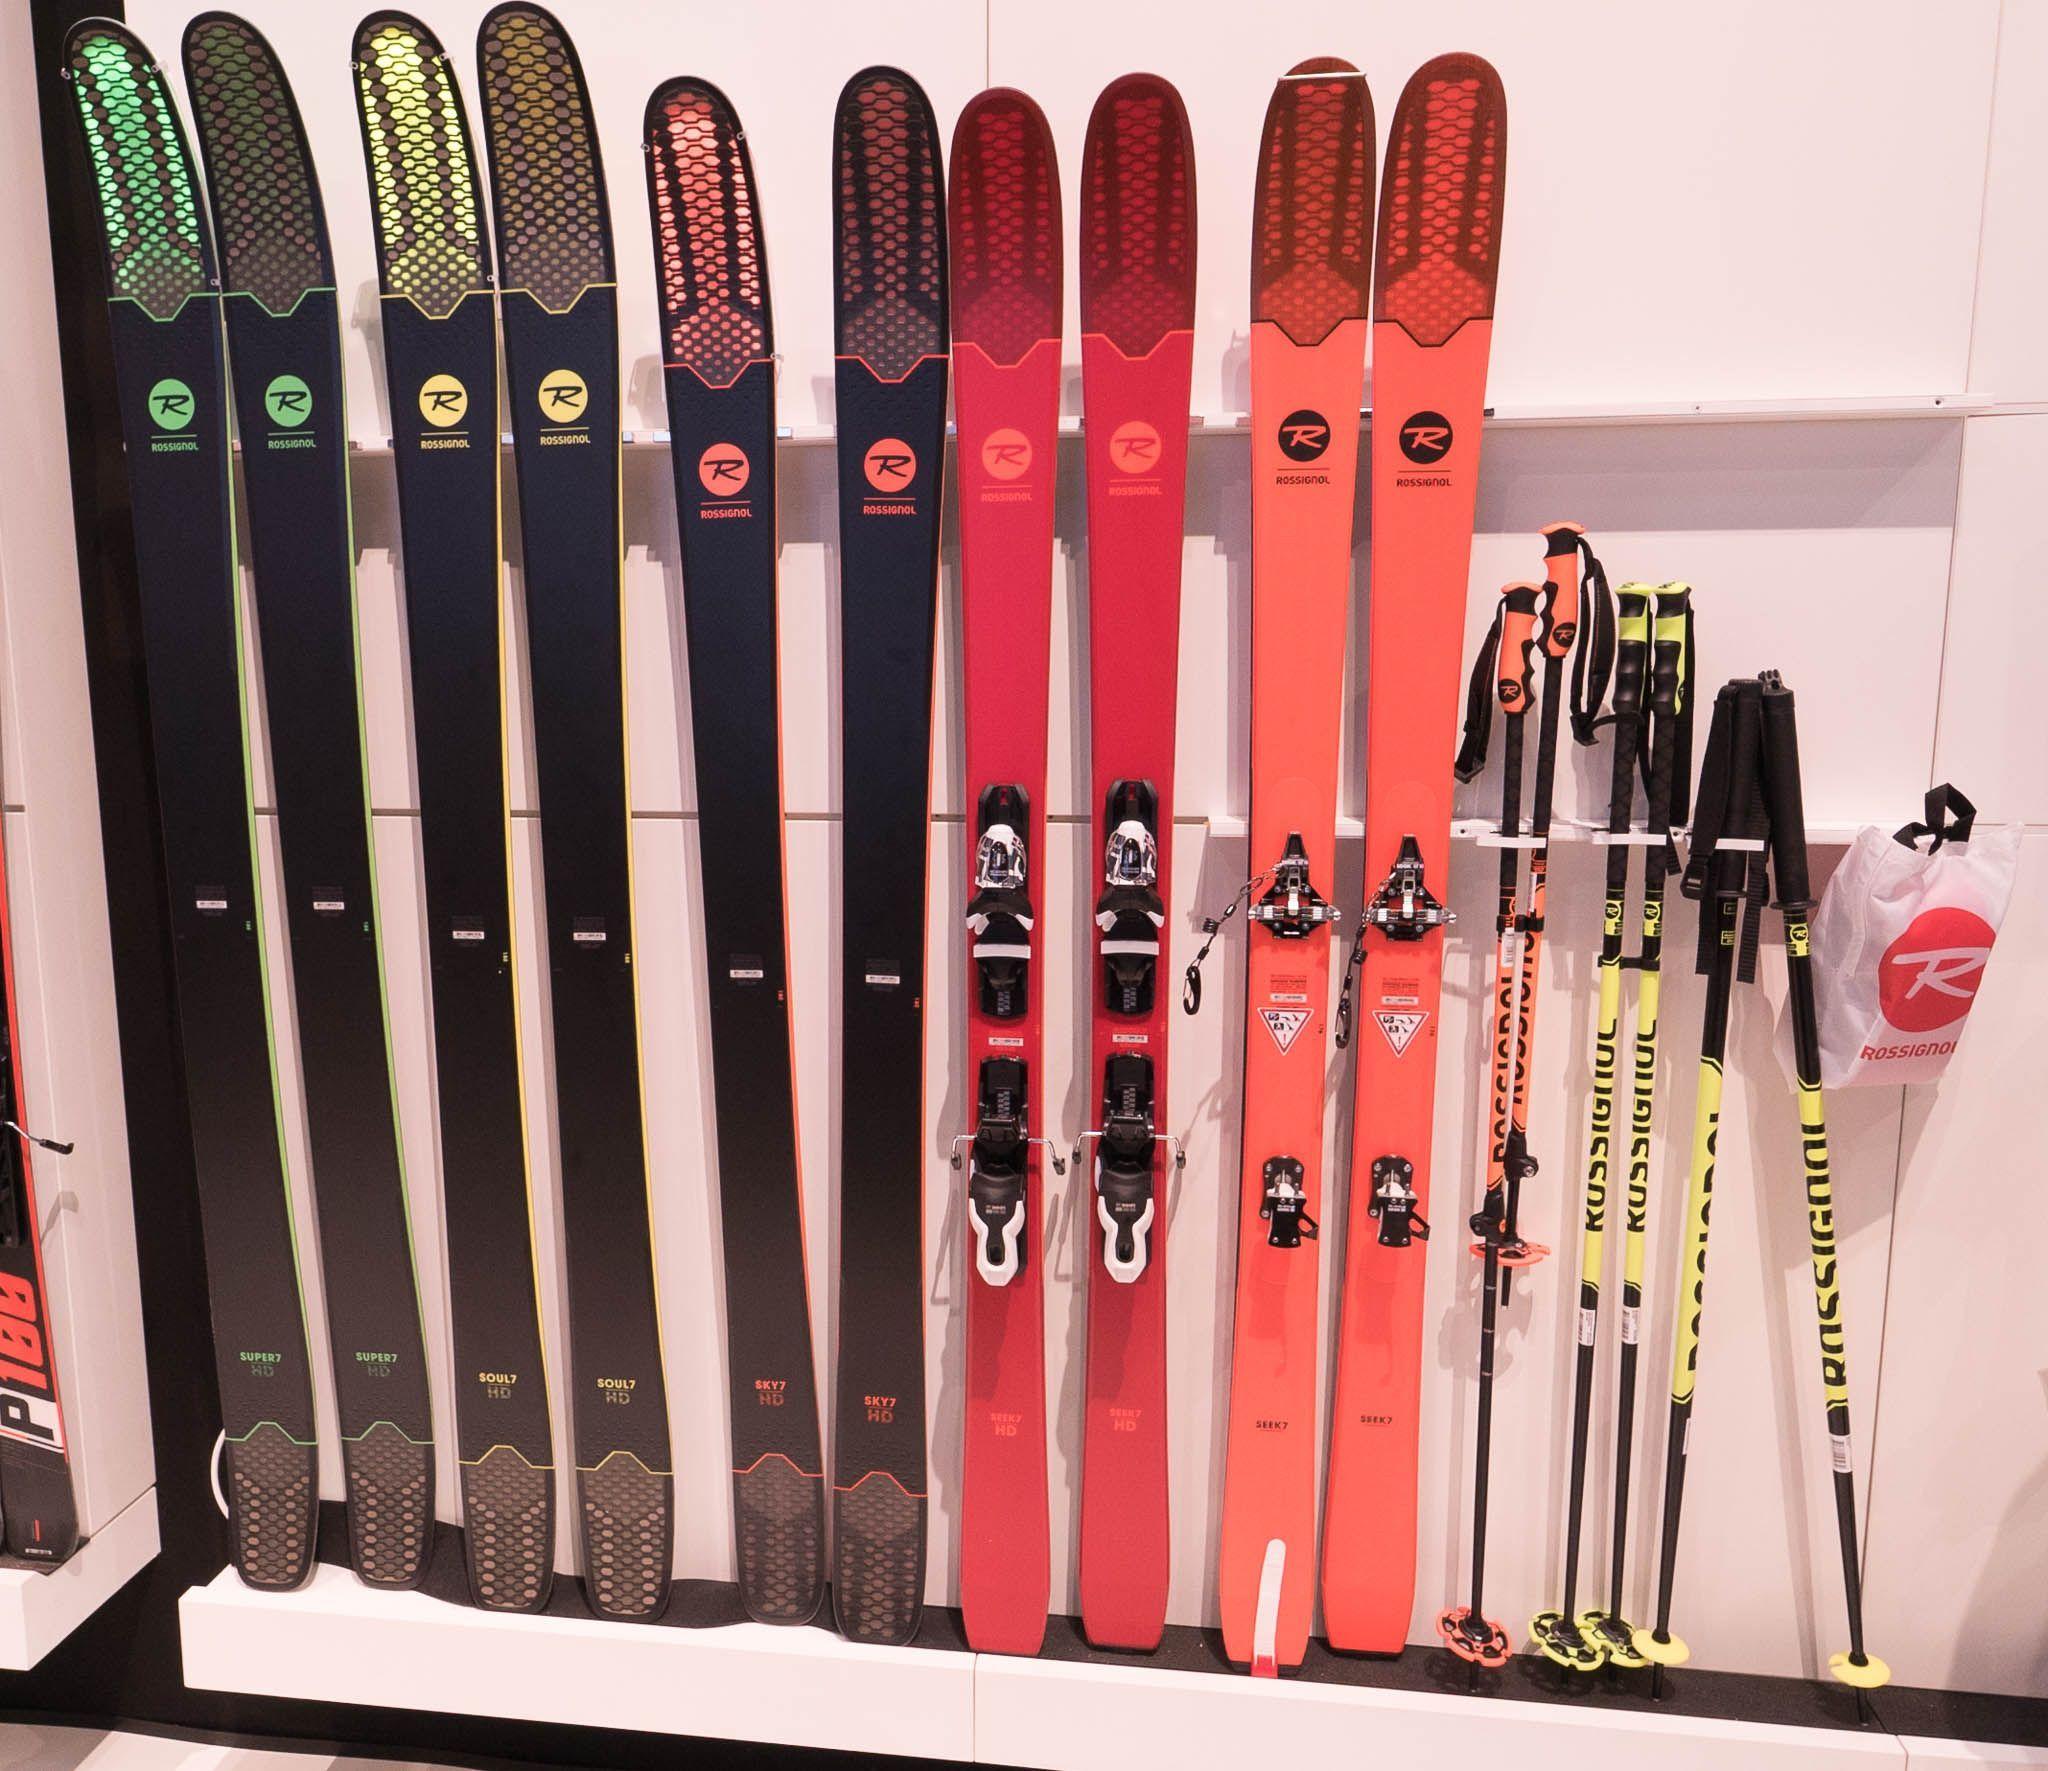 Ispo 2018 Rossignol Soul 7 Series Super 7 Hd Soul 7 Hd Sky 7 Hd Seek 7 Hd Seek 7 Skiingequipment Skiing Snowboarding Trip Ski Equipment